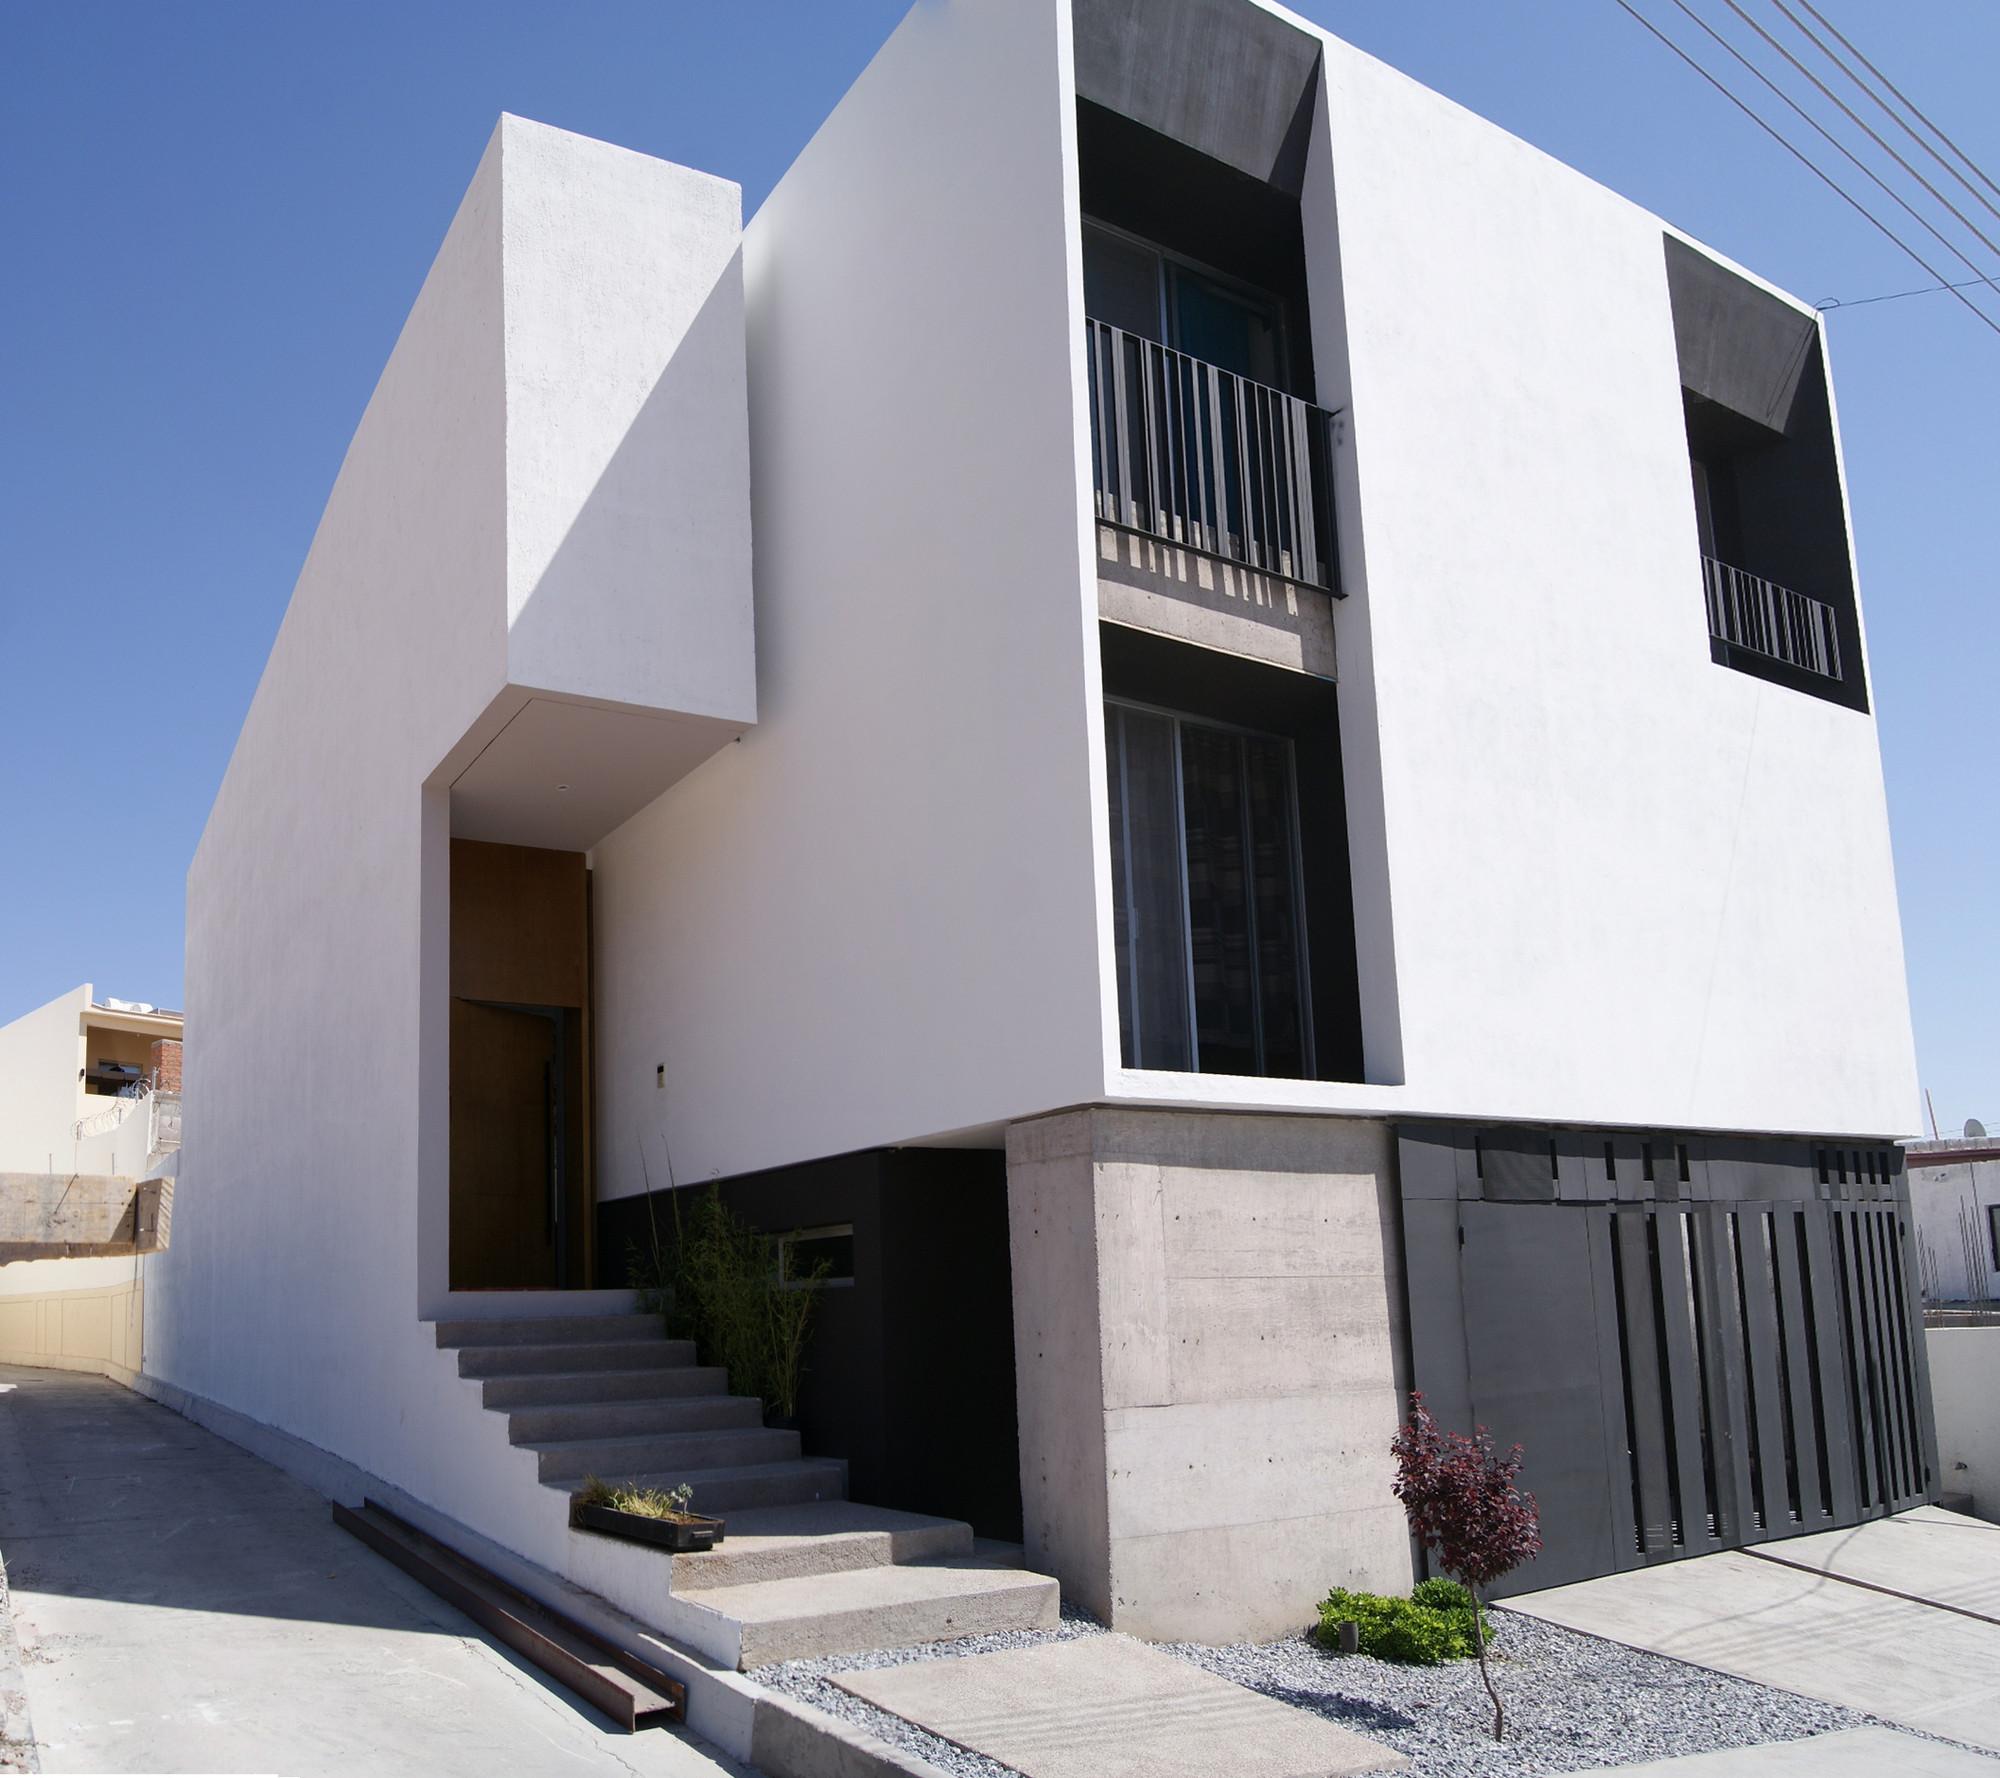 MG-Ch House / Tmv Arquitectura + Francisco Montes Villa, © Ivan Minjarez